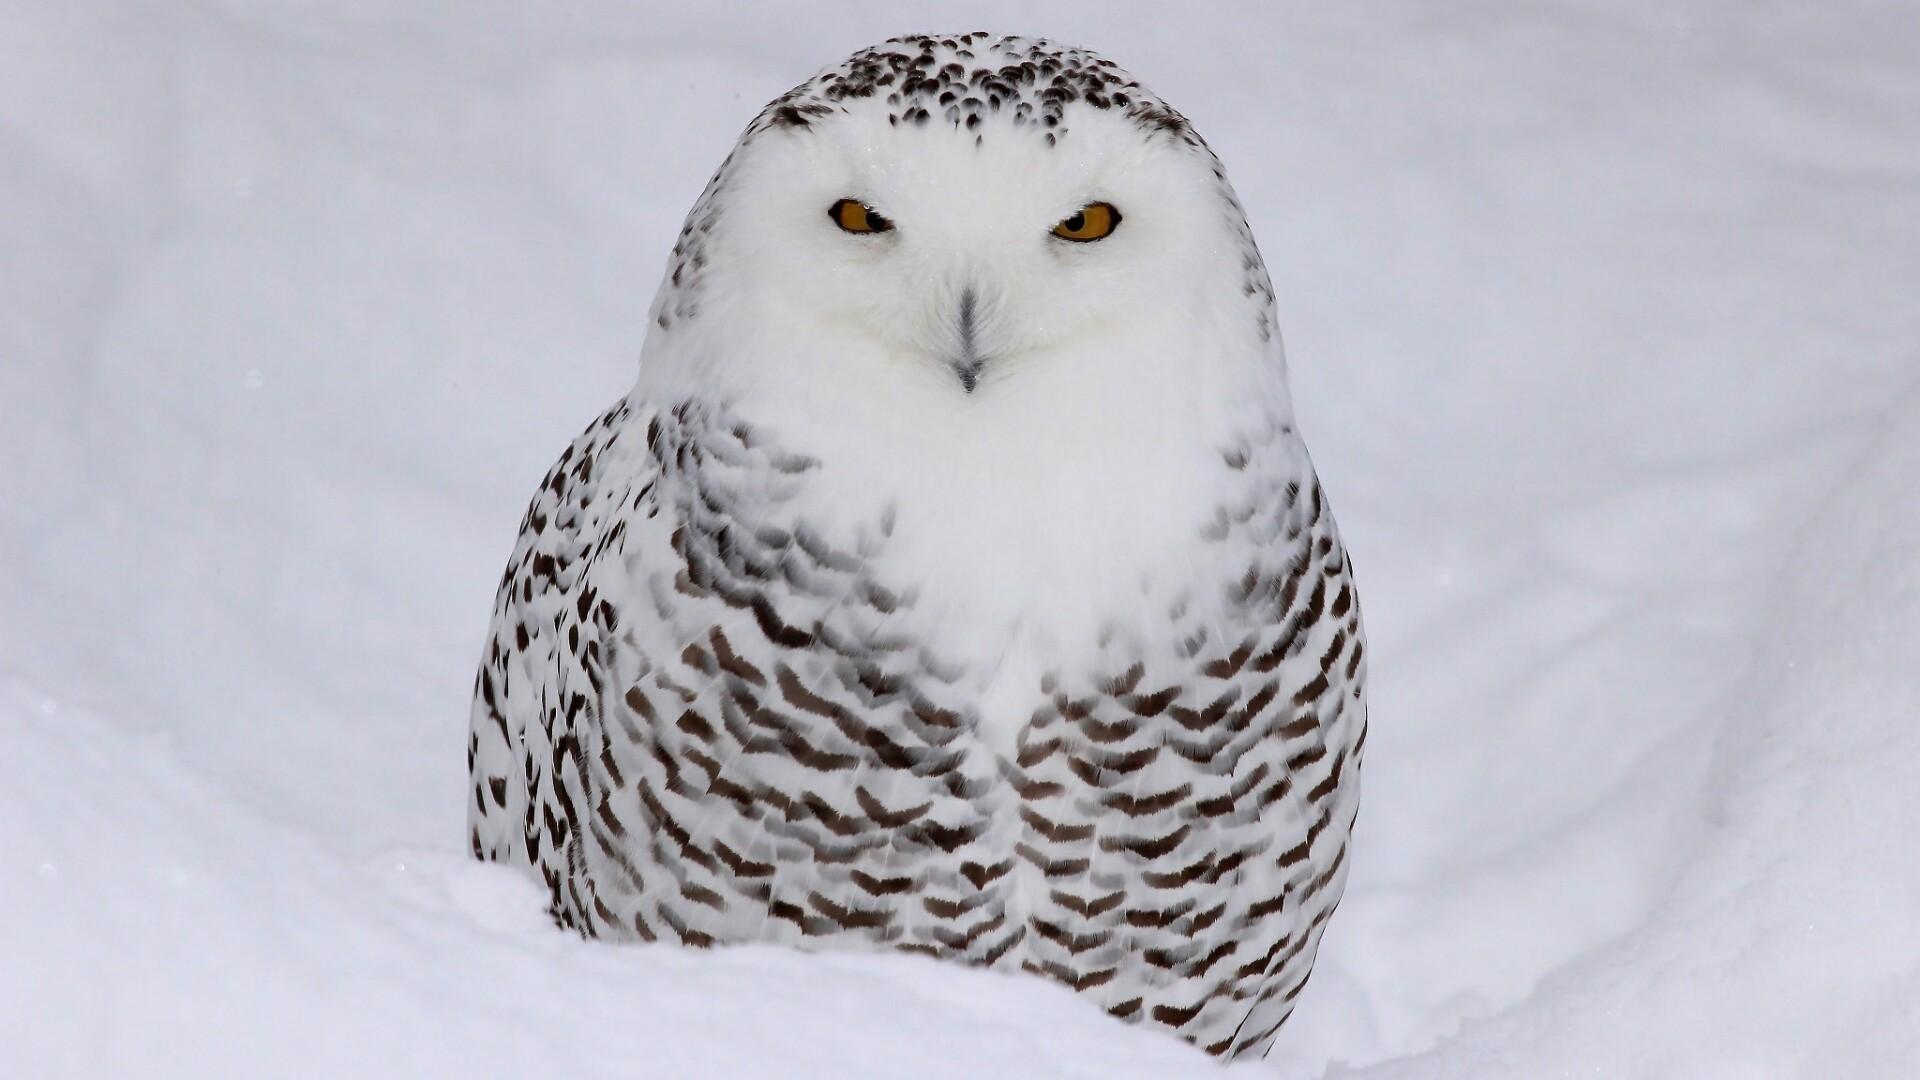 Res: 1920x1080, 1920x1200 white owl hd wallpaper pictures images hd desktop wallpapers  windows 4k 1920×1200 Wallpaper HD